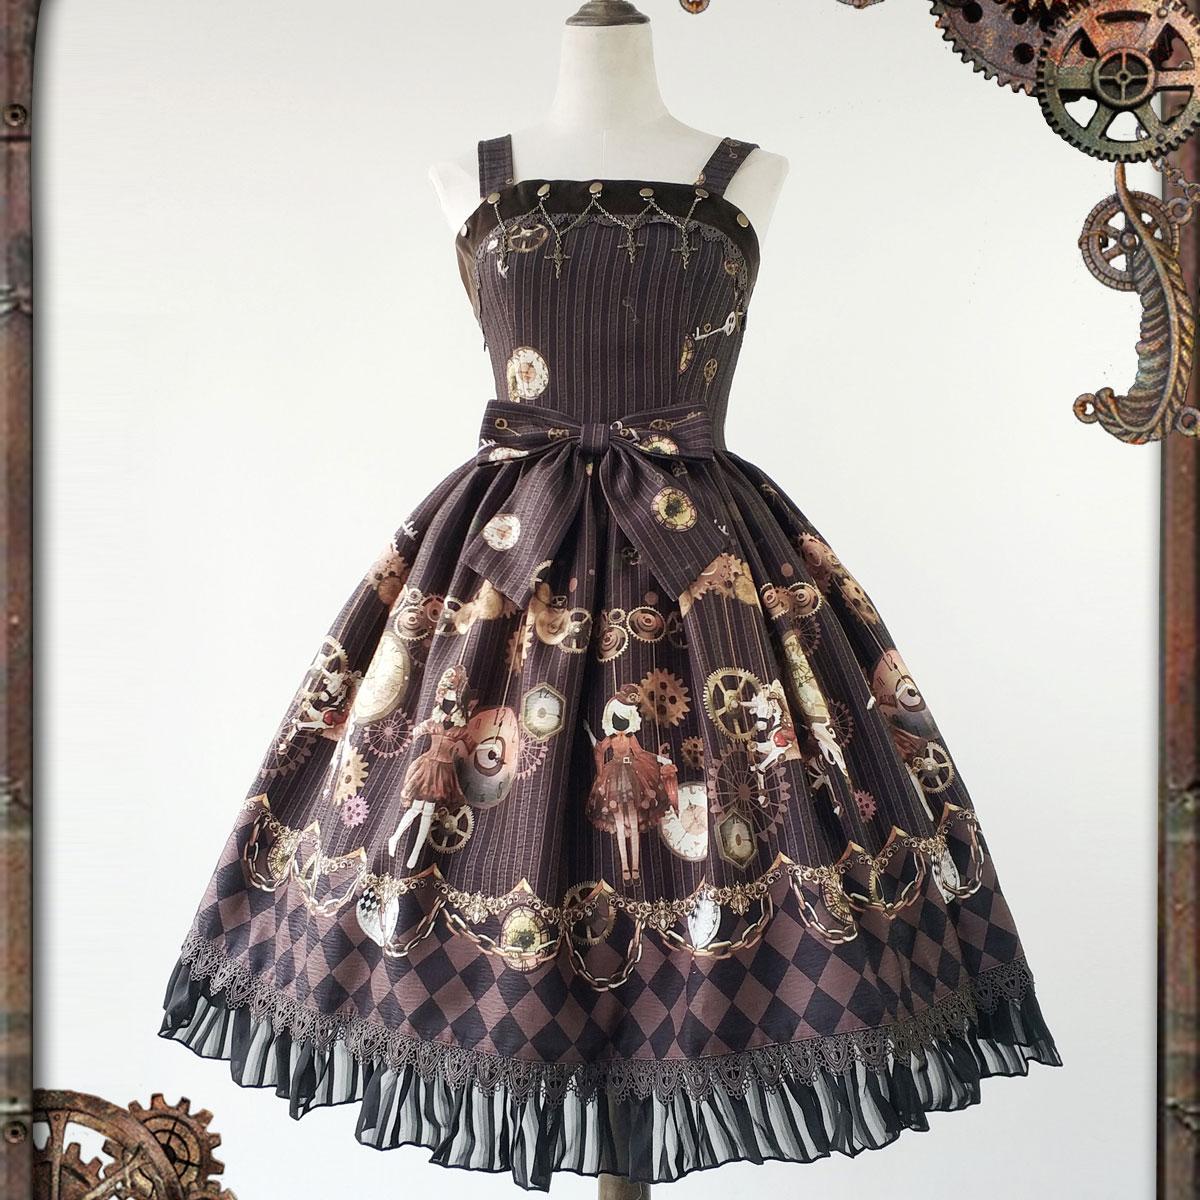 Women s Steampunk Dress Mechanical Doll Series Printed Lolita JSK Dress by Infanta Pre order